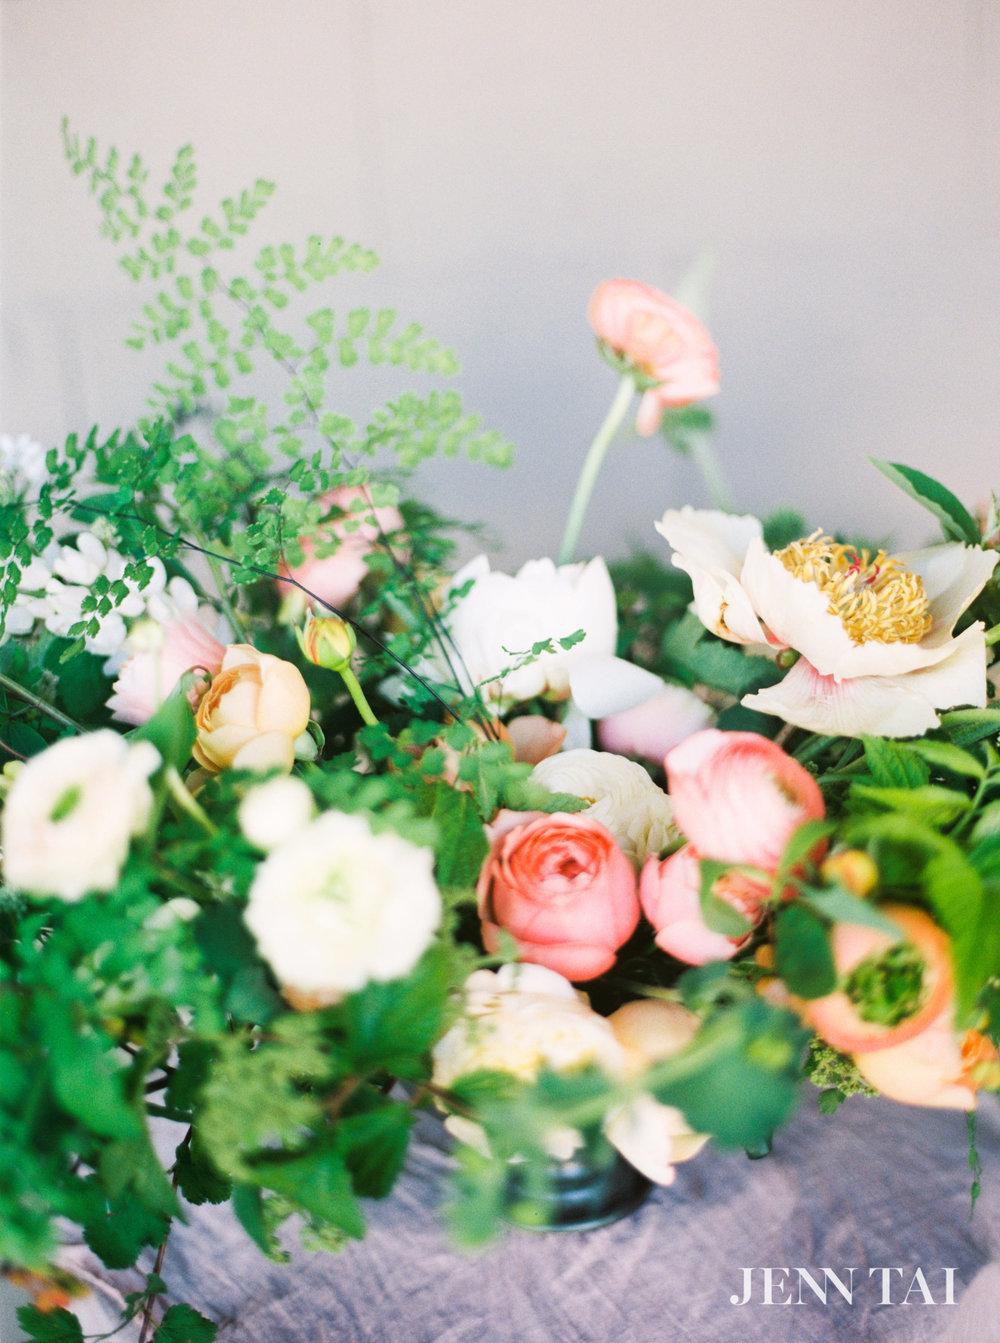 seattle-wedding-photographer-jenn-tai-max-gill-workshop-seattle-maura7669.JPG